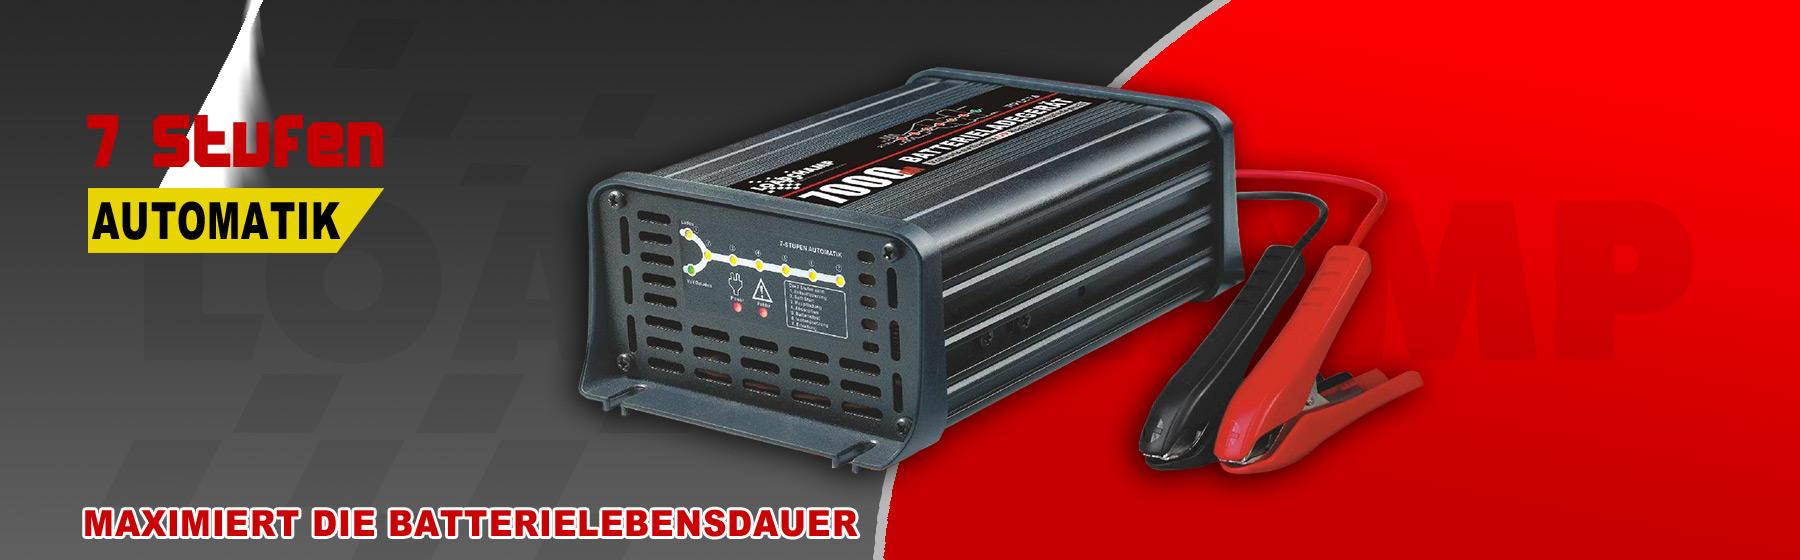 automatische batterie ladeger te und solar. Black Bedroom Furniture Sets. Home Design Ideas